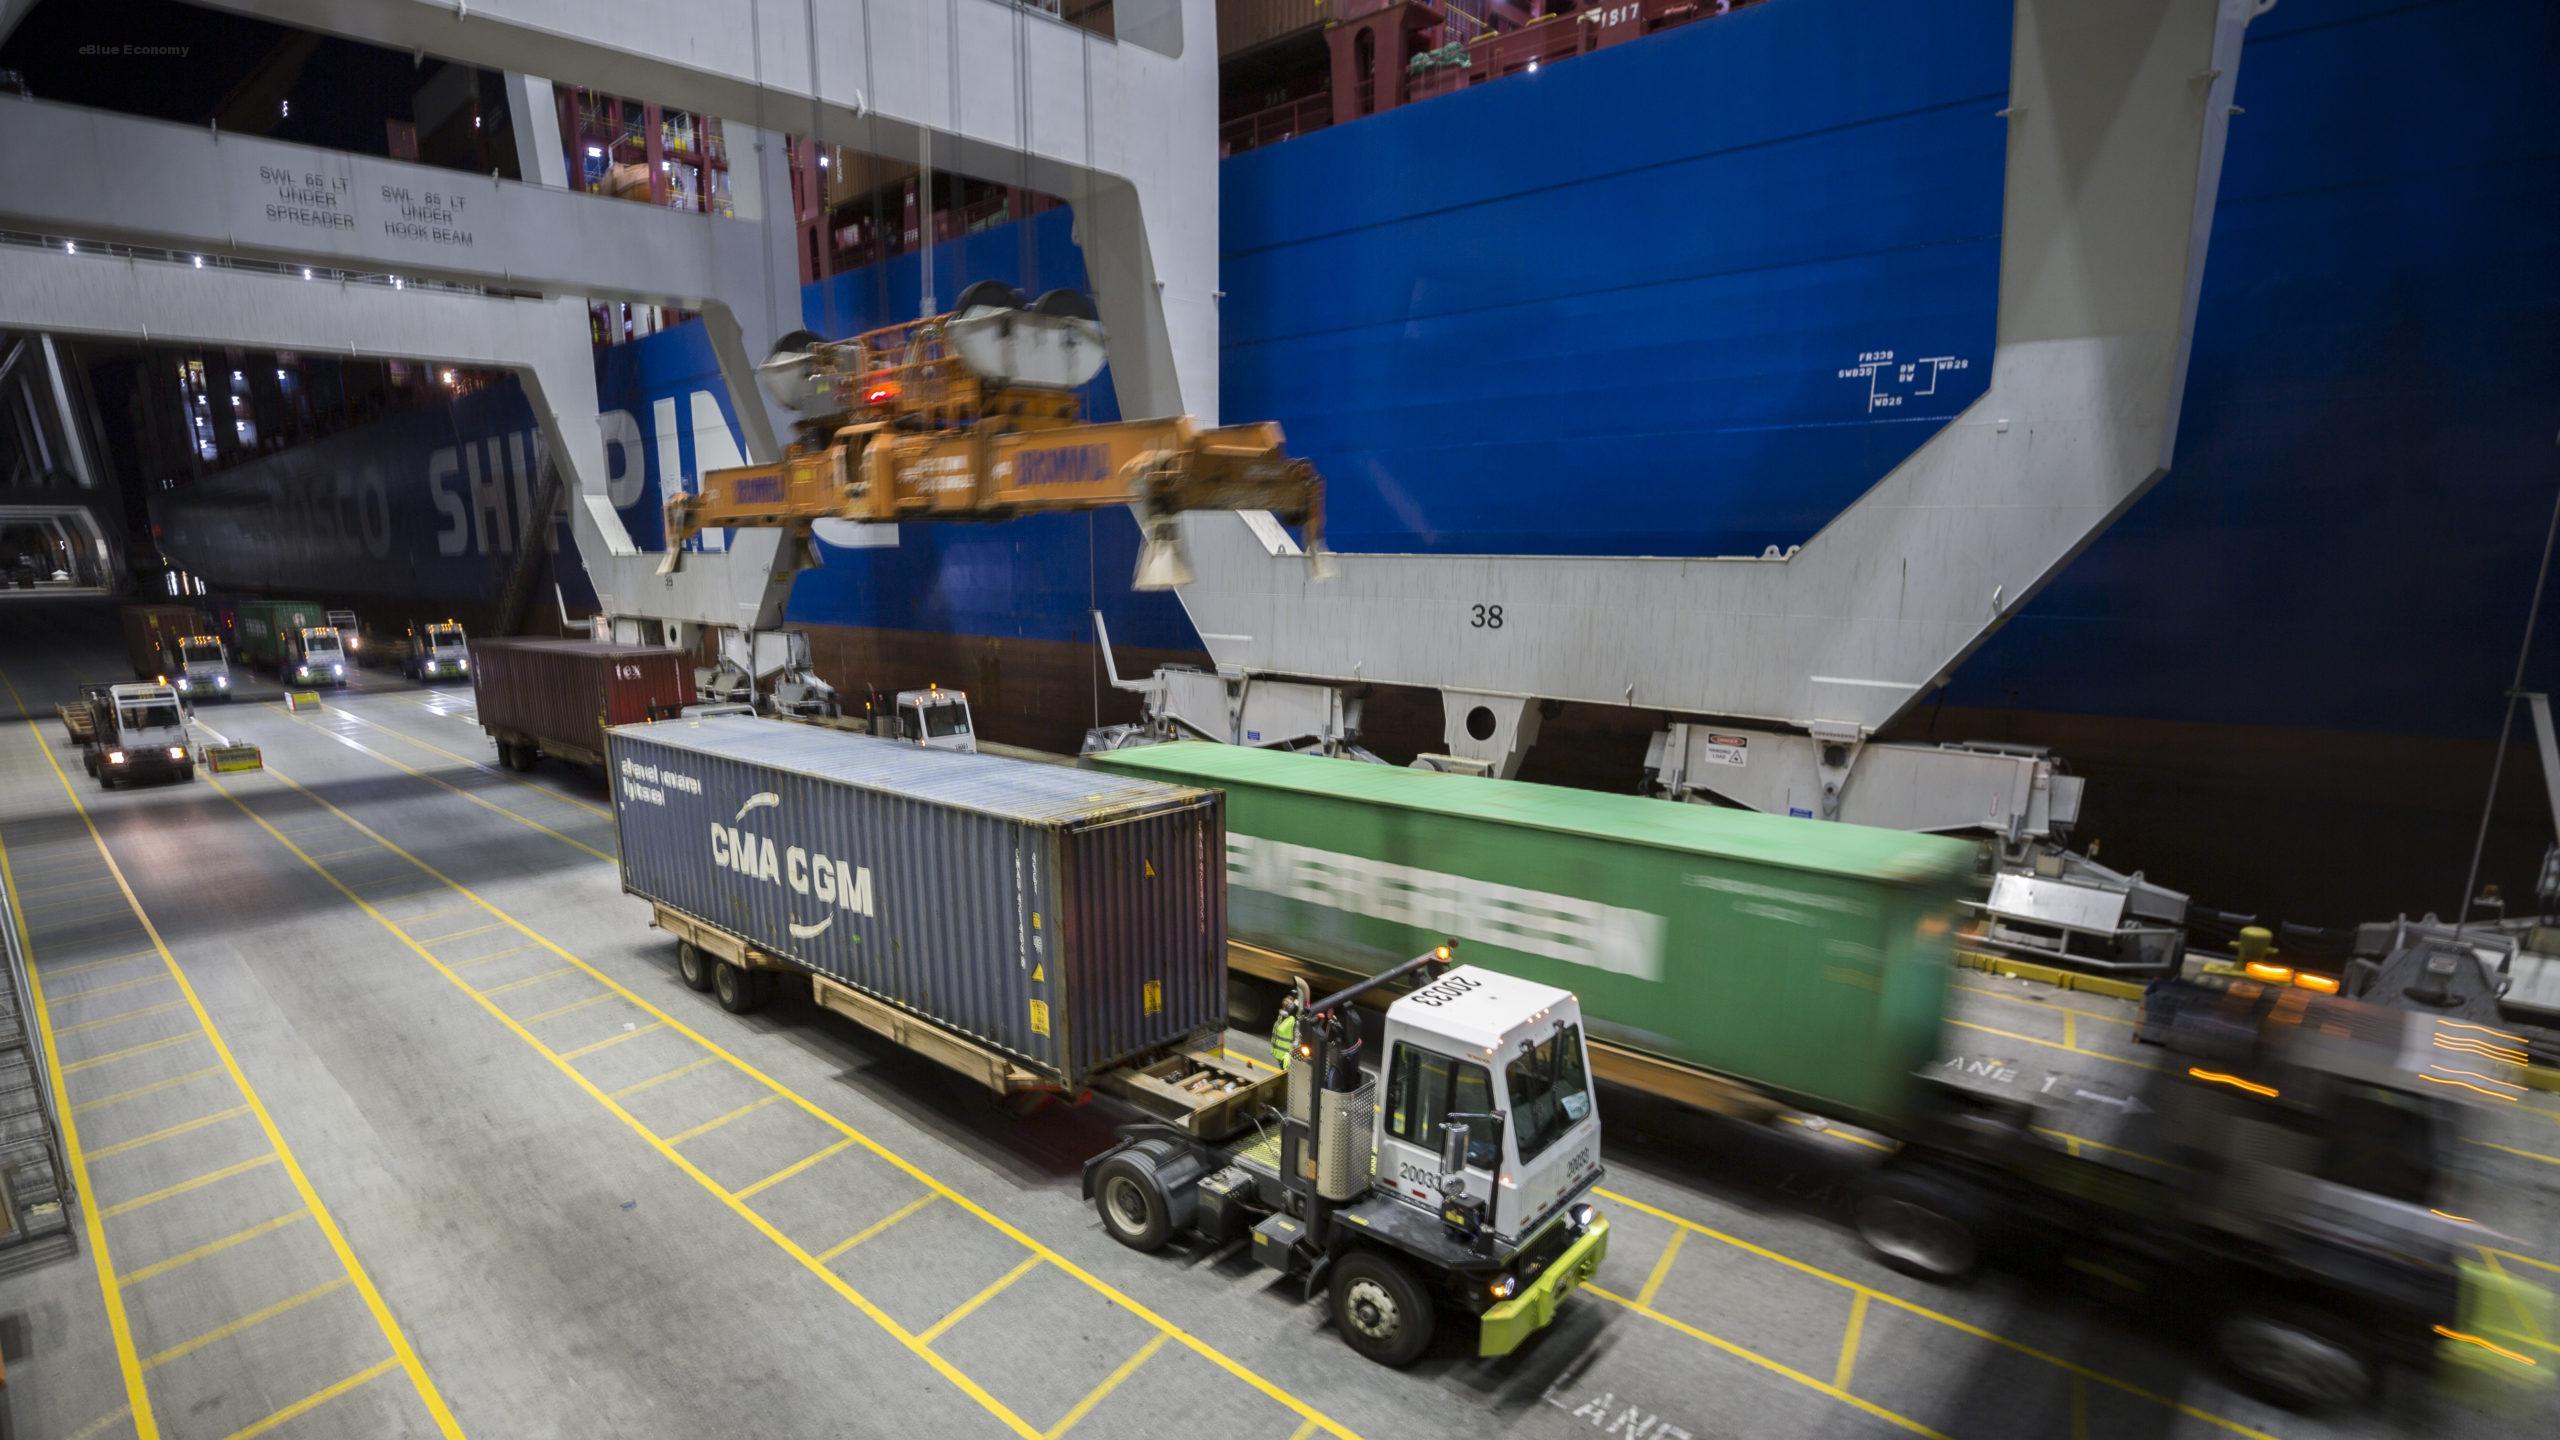 eBlue_economy_ Port of Savannah handled